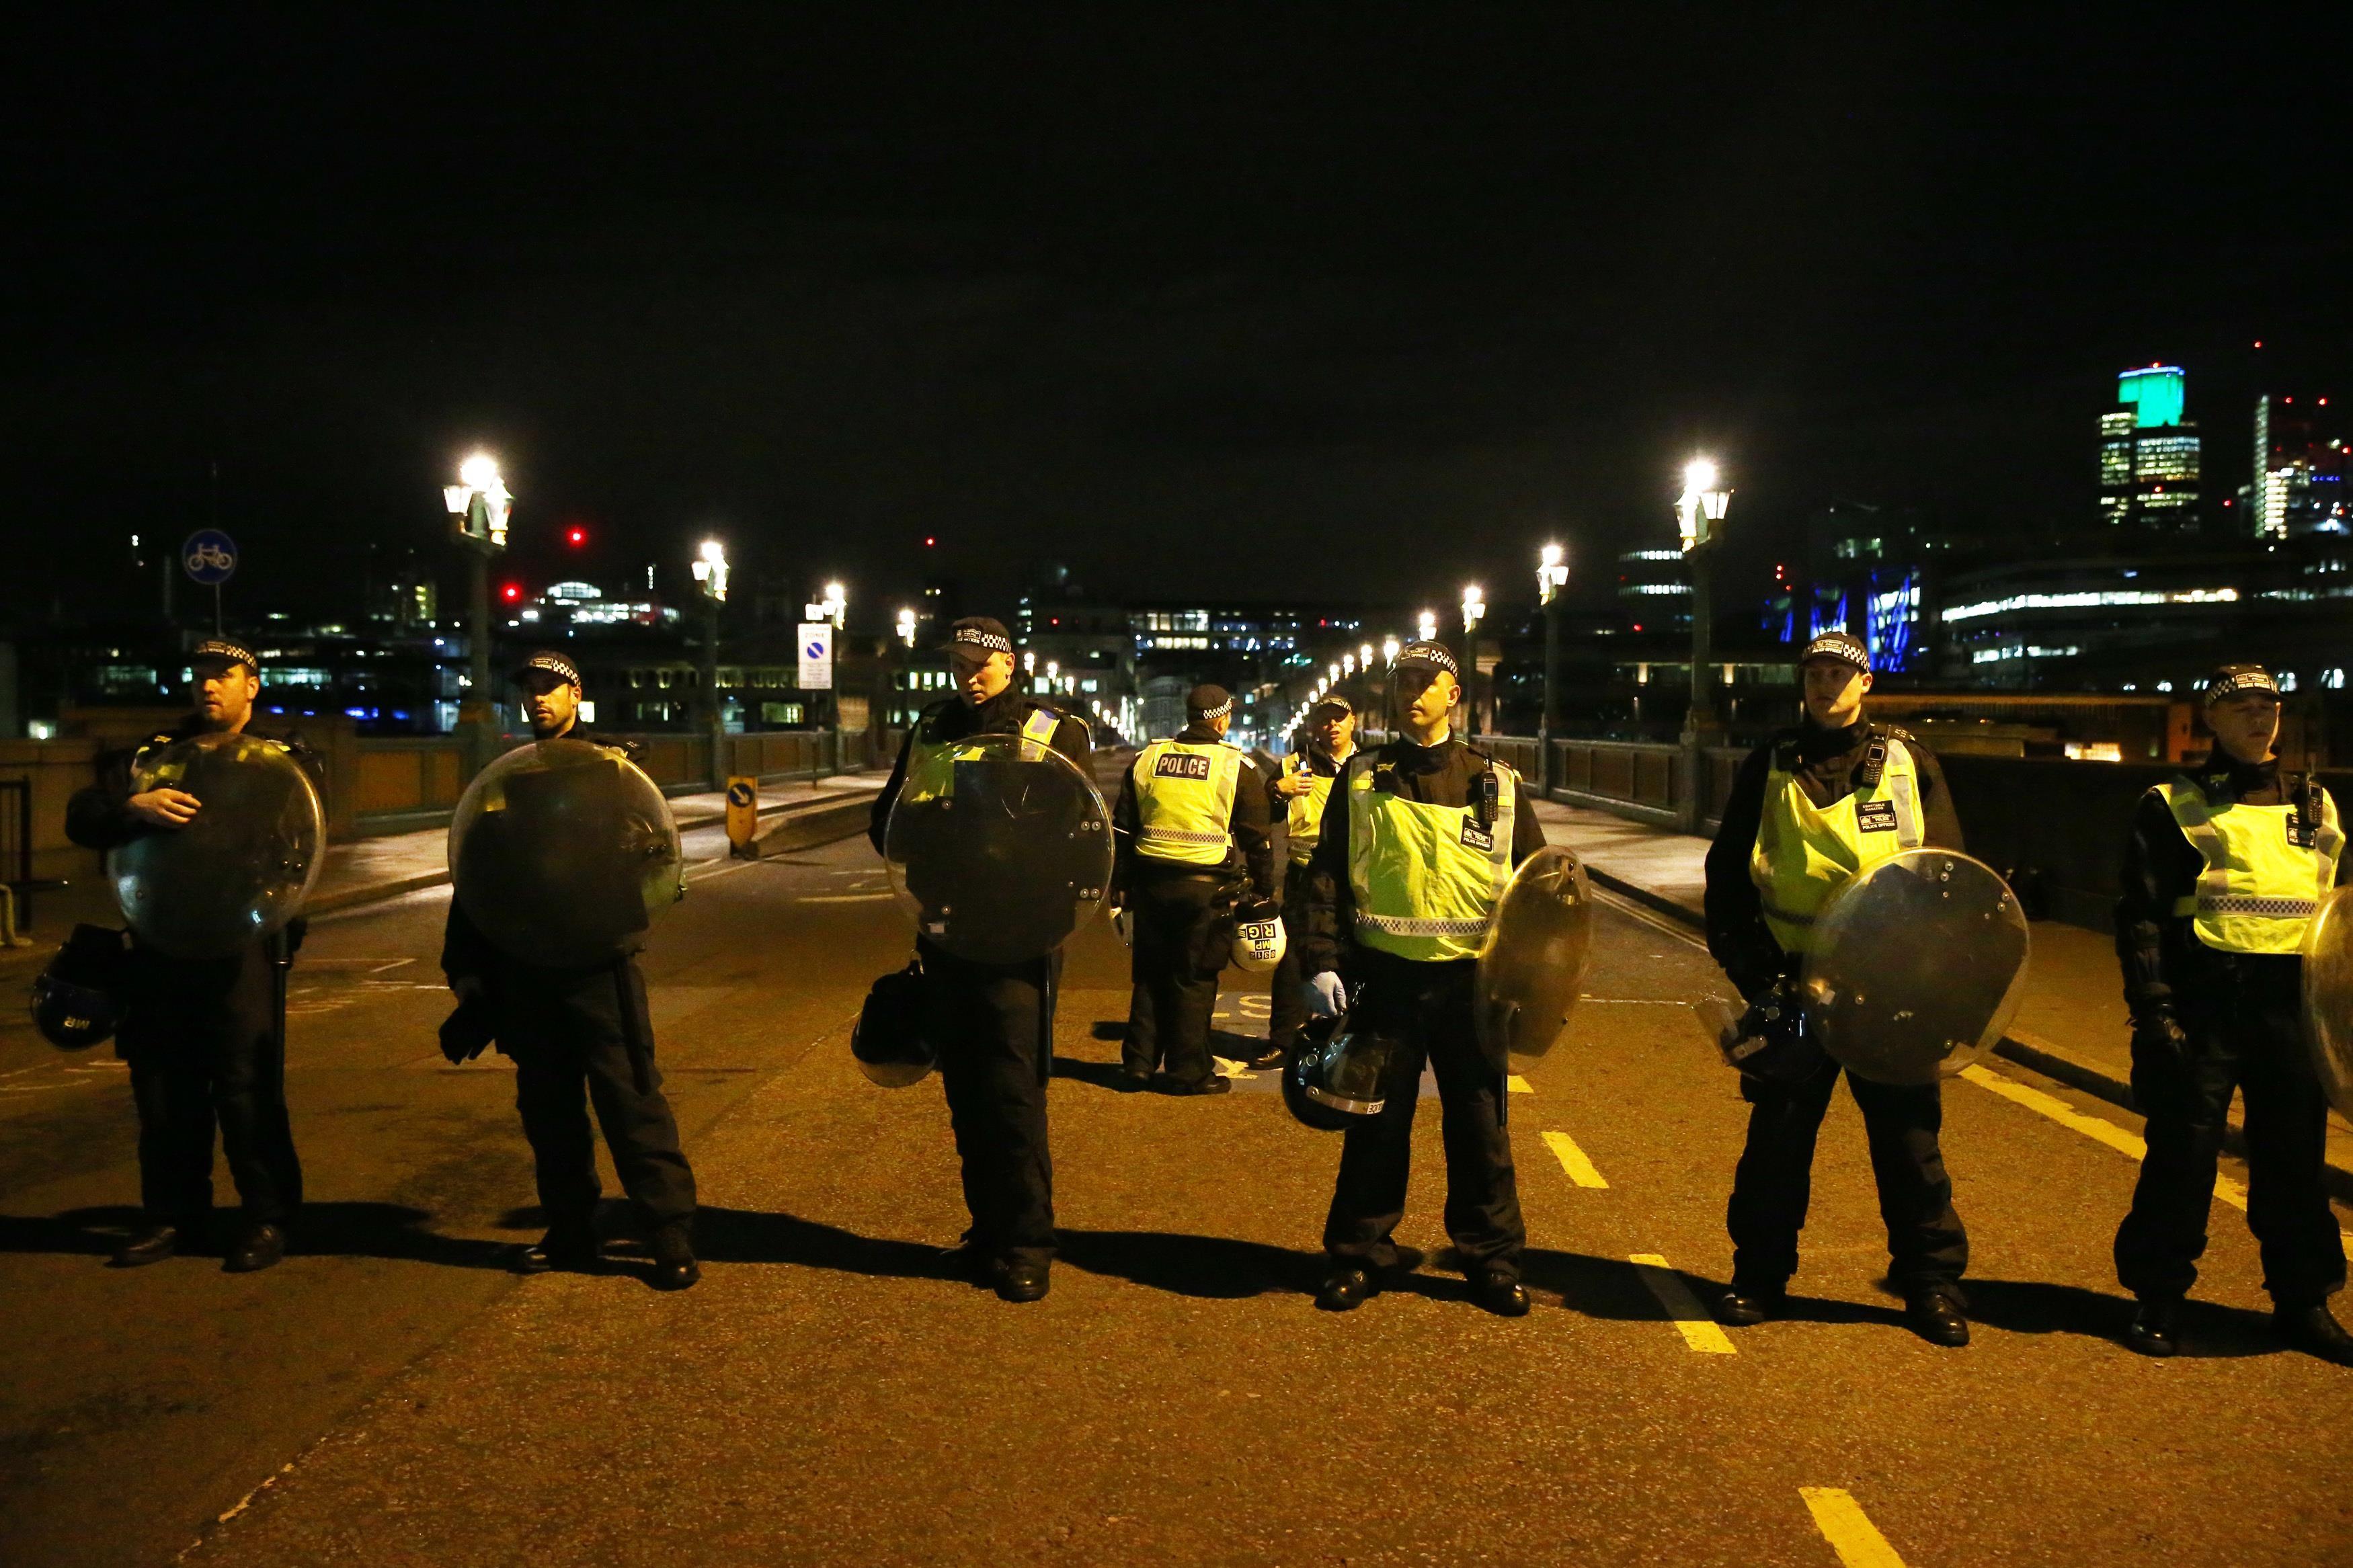 <p><span>Место ЧП в Лондоне. Фото: &copy; REUTERS/Neil Hall</span></p>